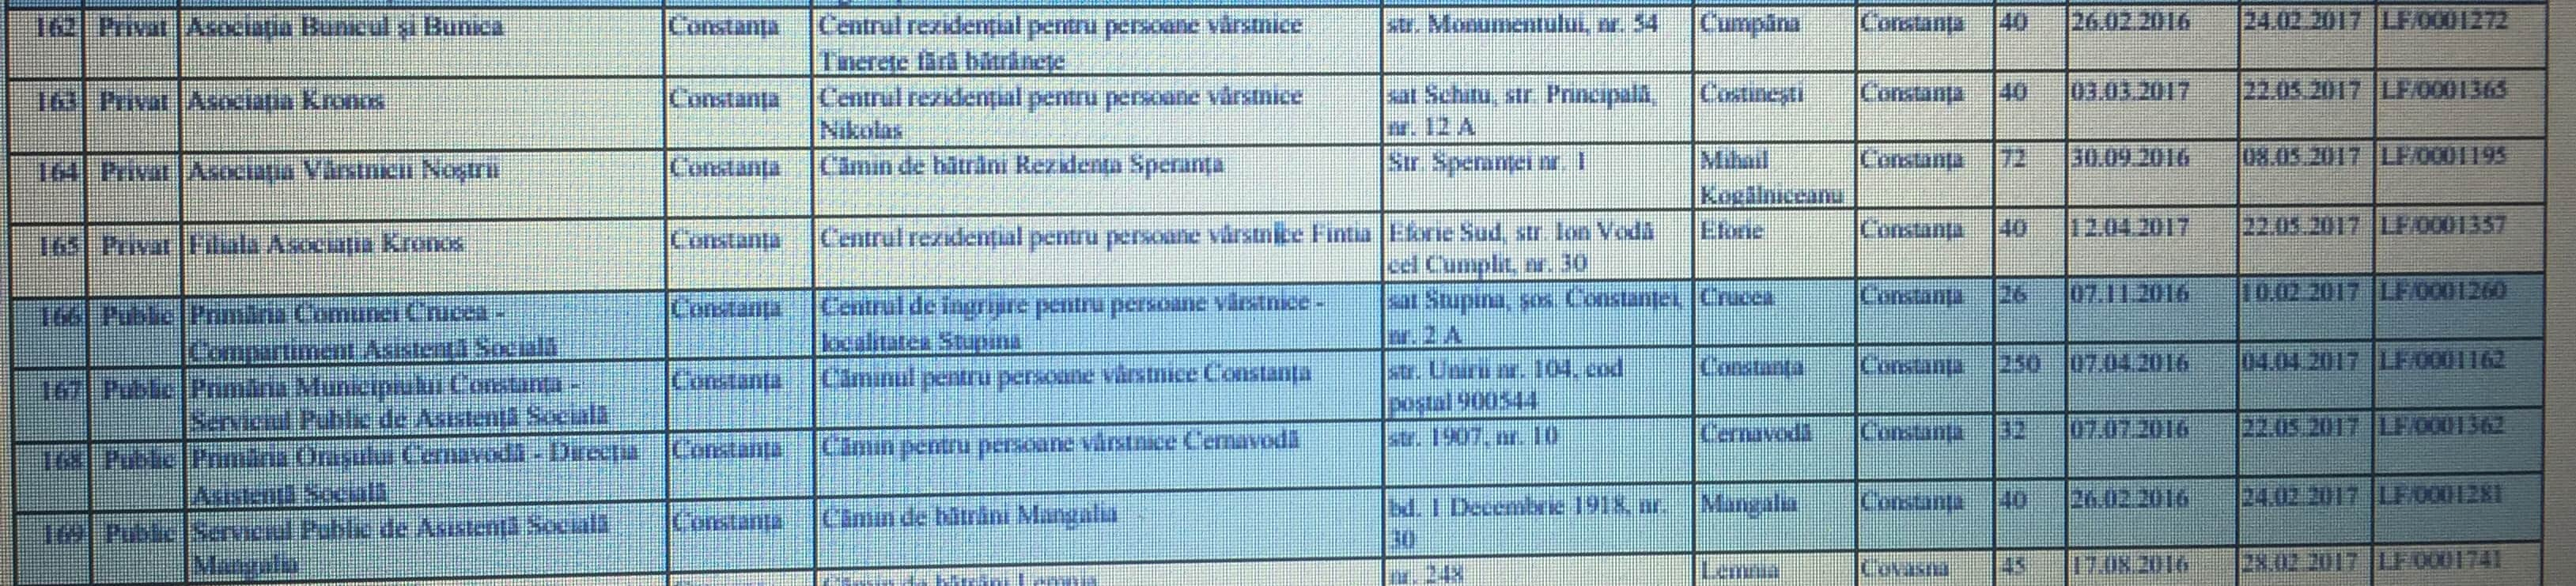 licente camine persoane varstnice Constanta_6076